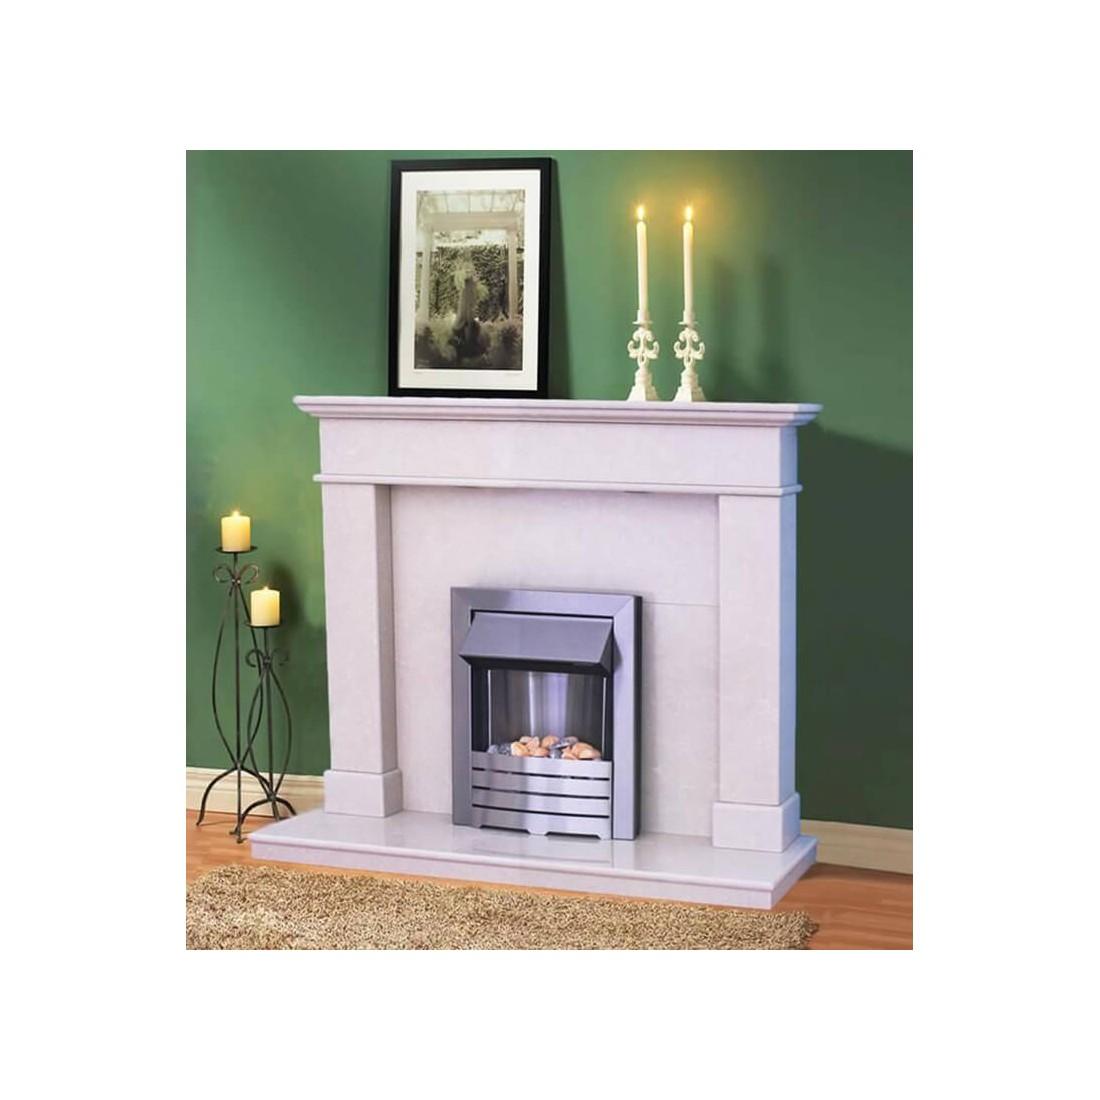 Balmoral Portuguese Limestone Fireplace Fireland Co Uk Free Delivery